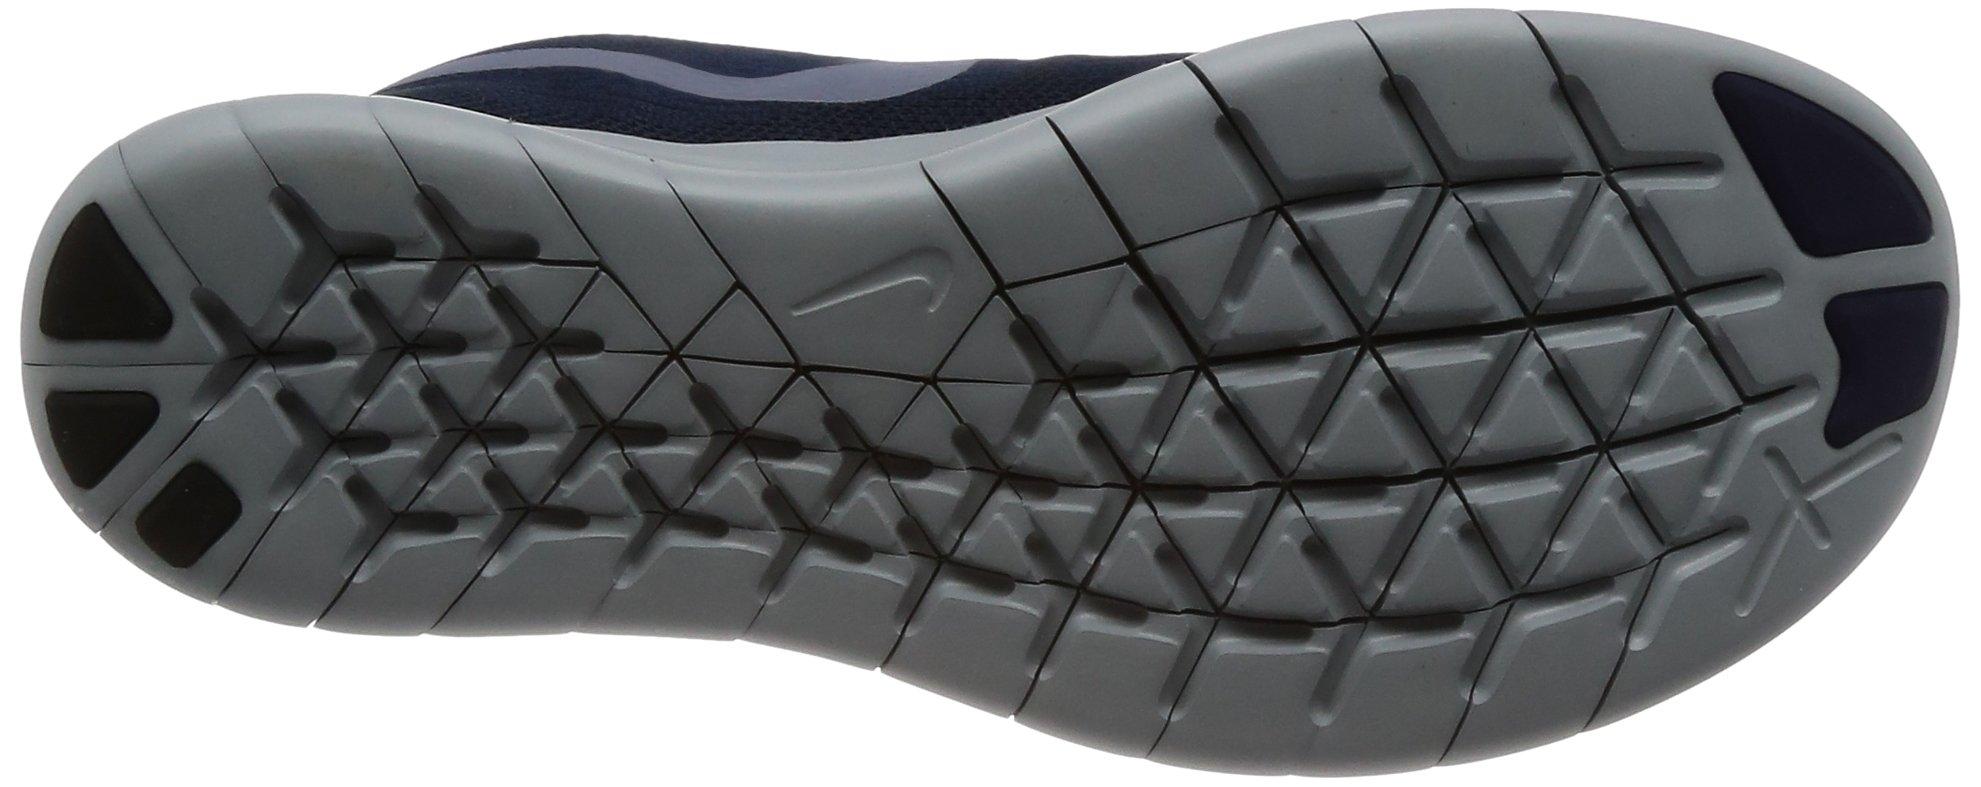 Nike Free RN 2017 Women's Running Shoes (6 M US, Binary Blue/Dark Sky Blue) by Nike (Image #3)